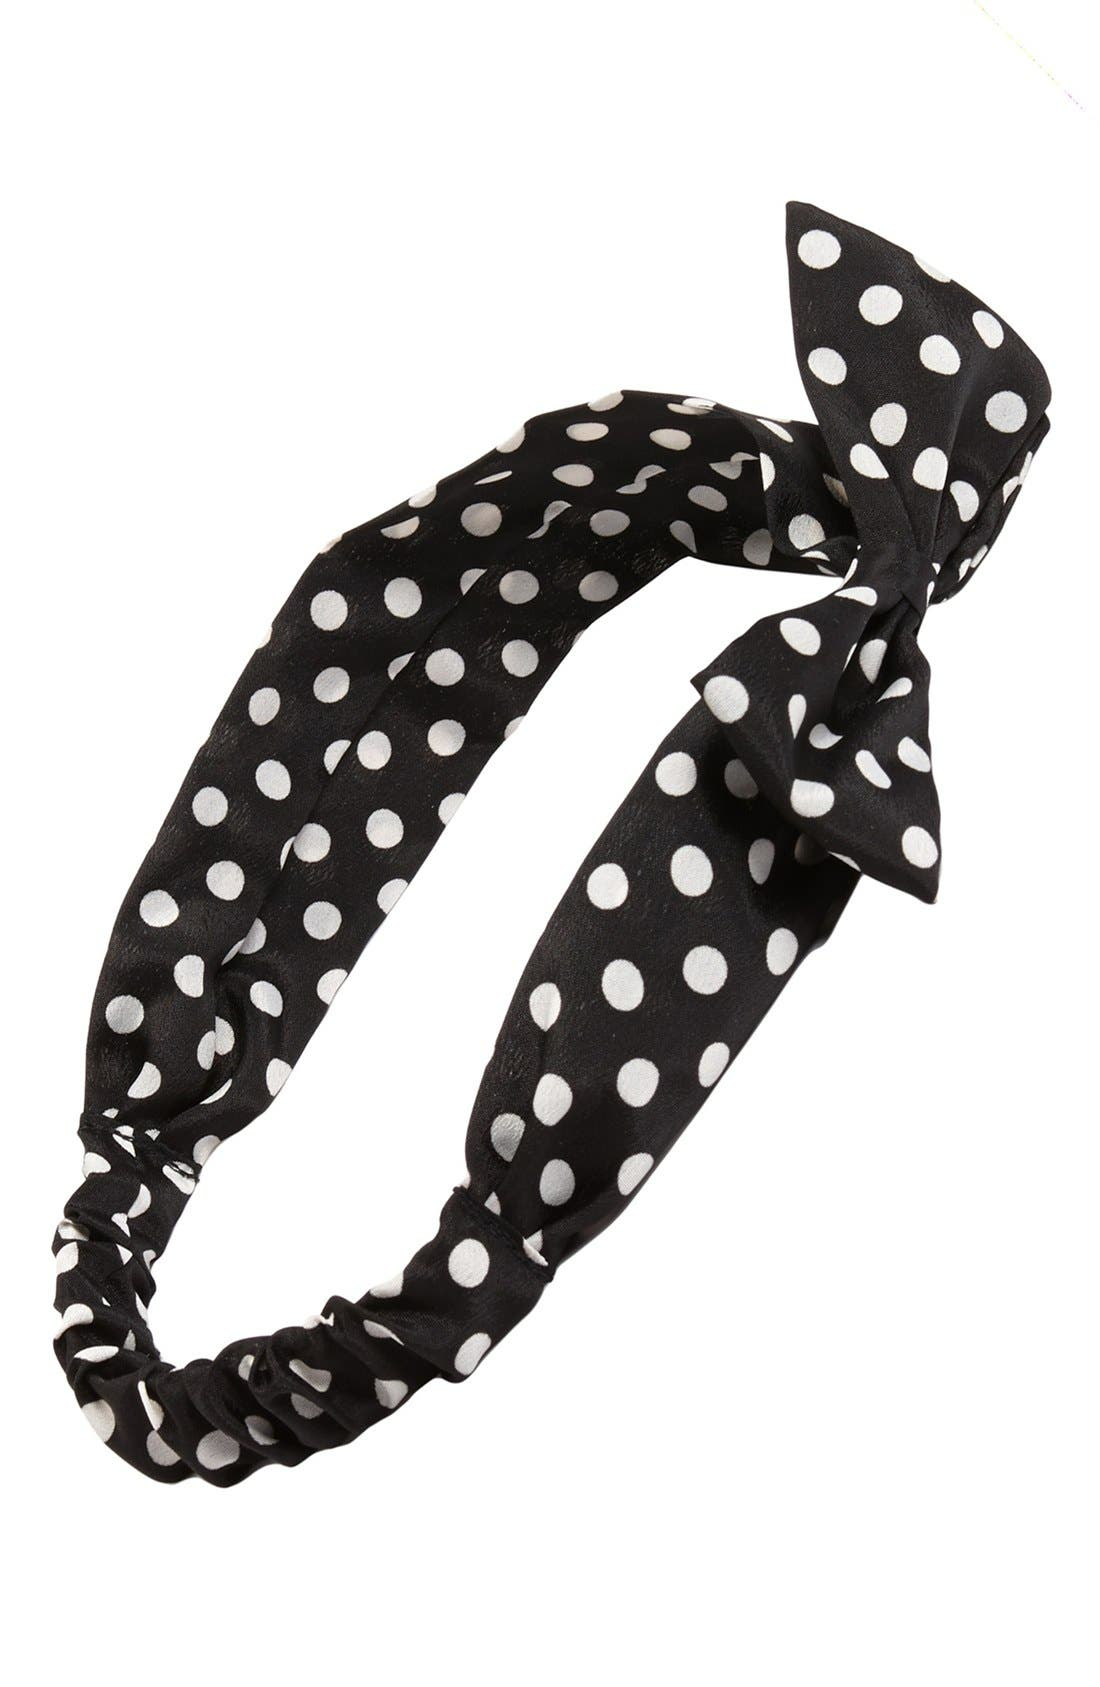 Alternate Image 1 Selected - Capelli of New York Polka Dot Bow Head Wrap